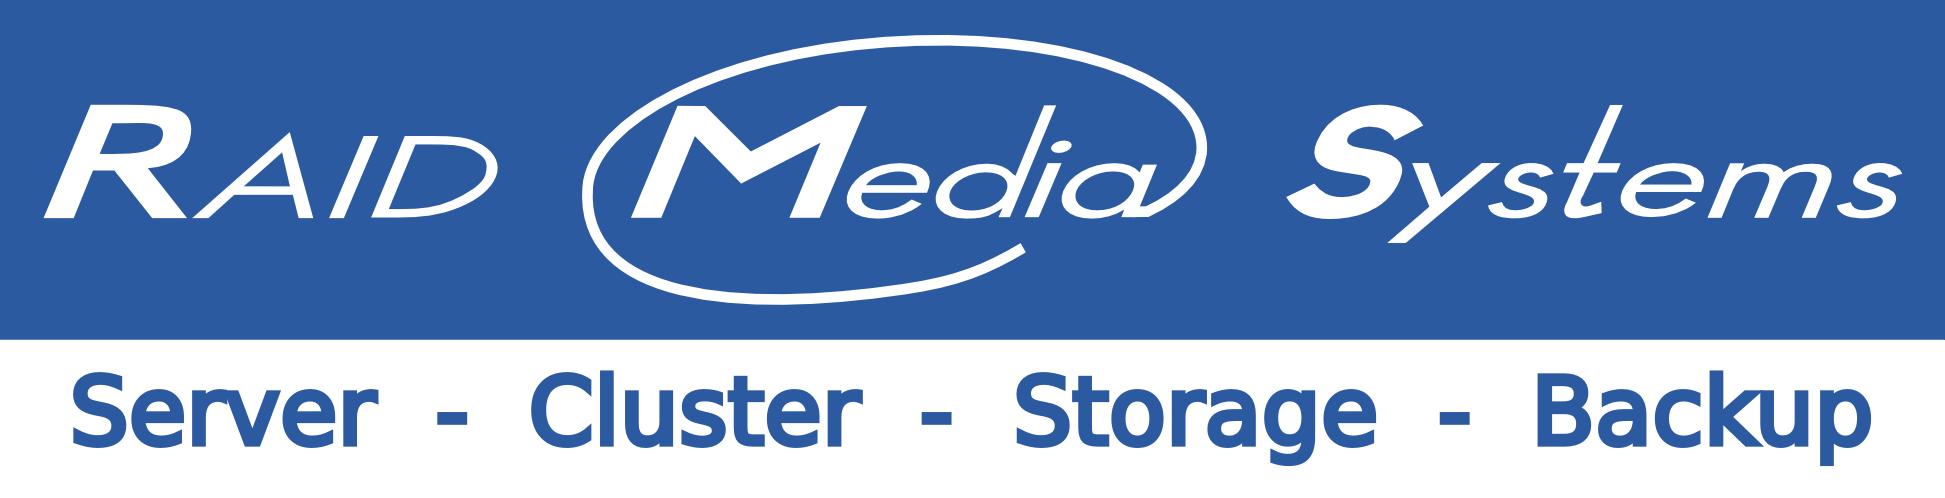 Raid Media Systems Logo